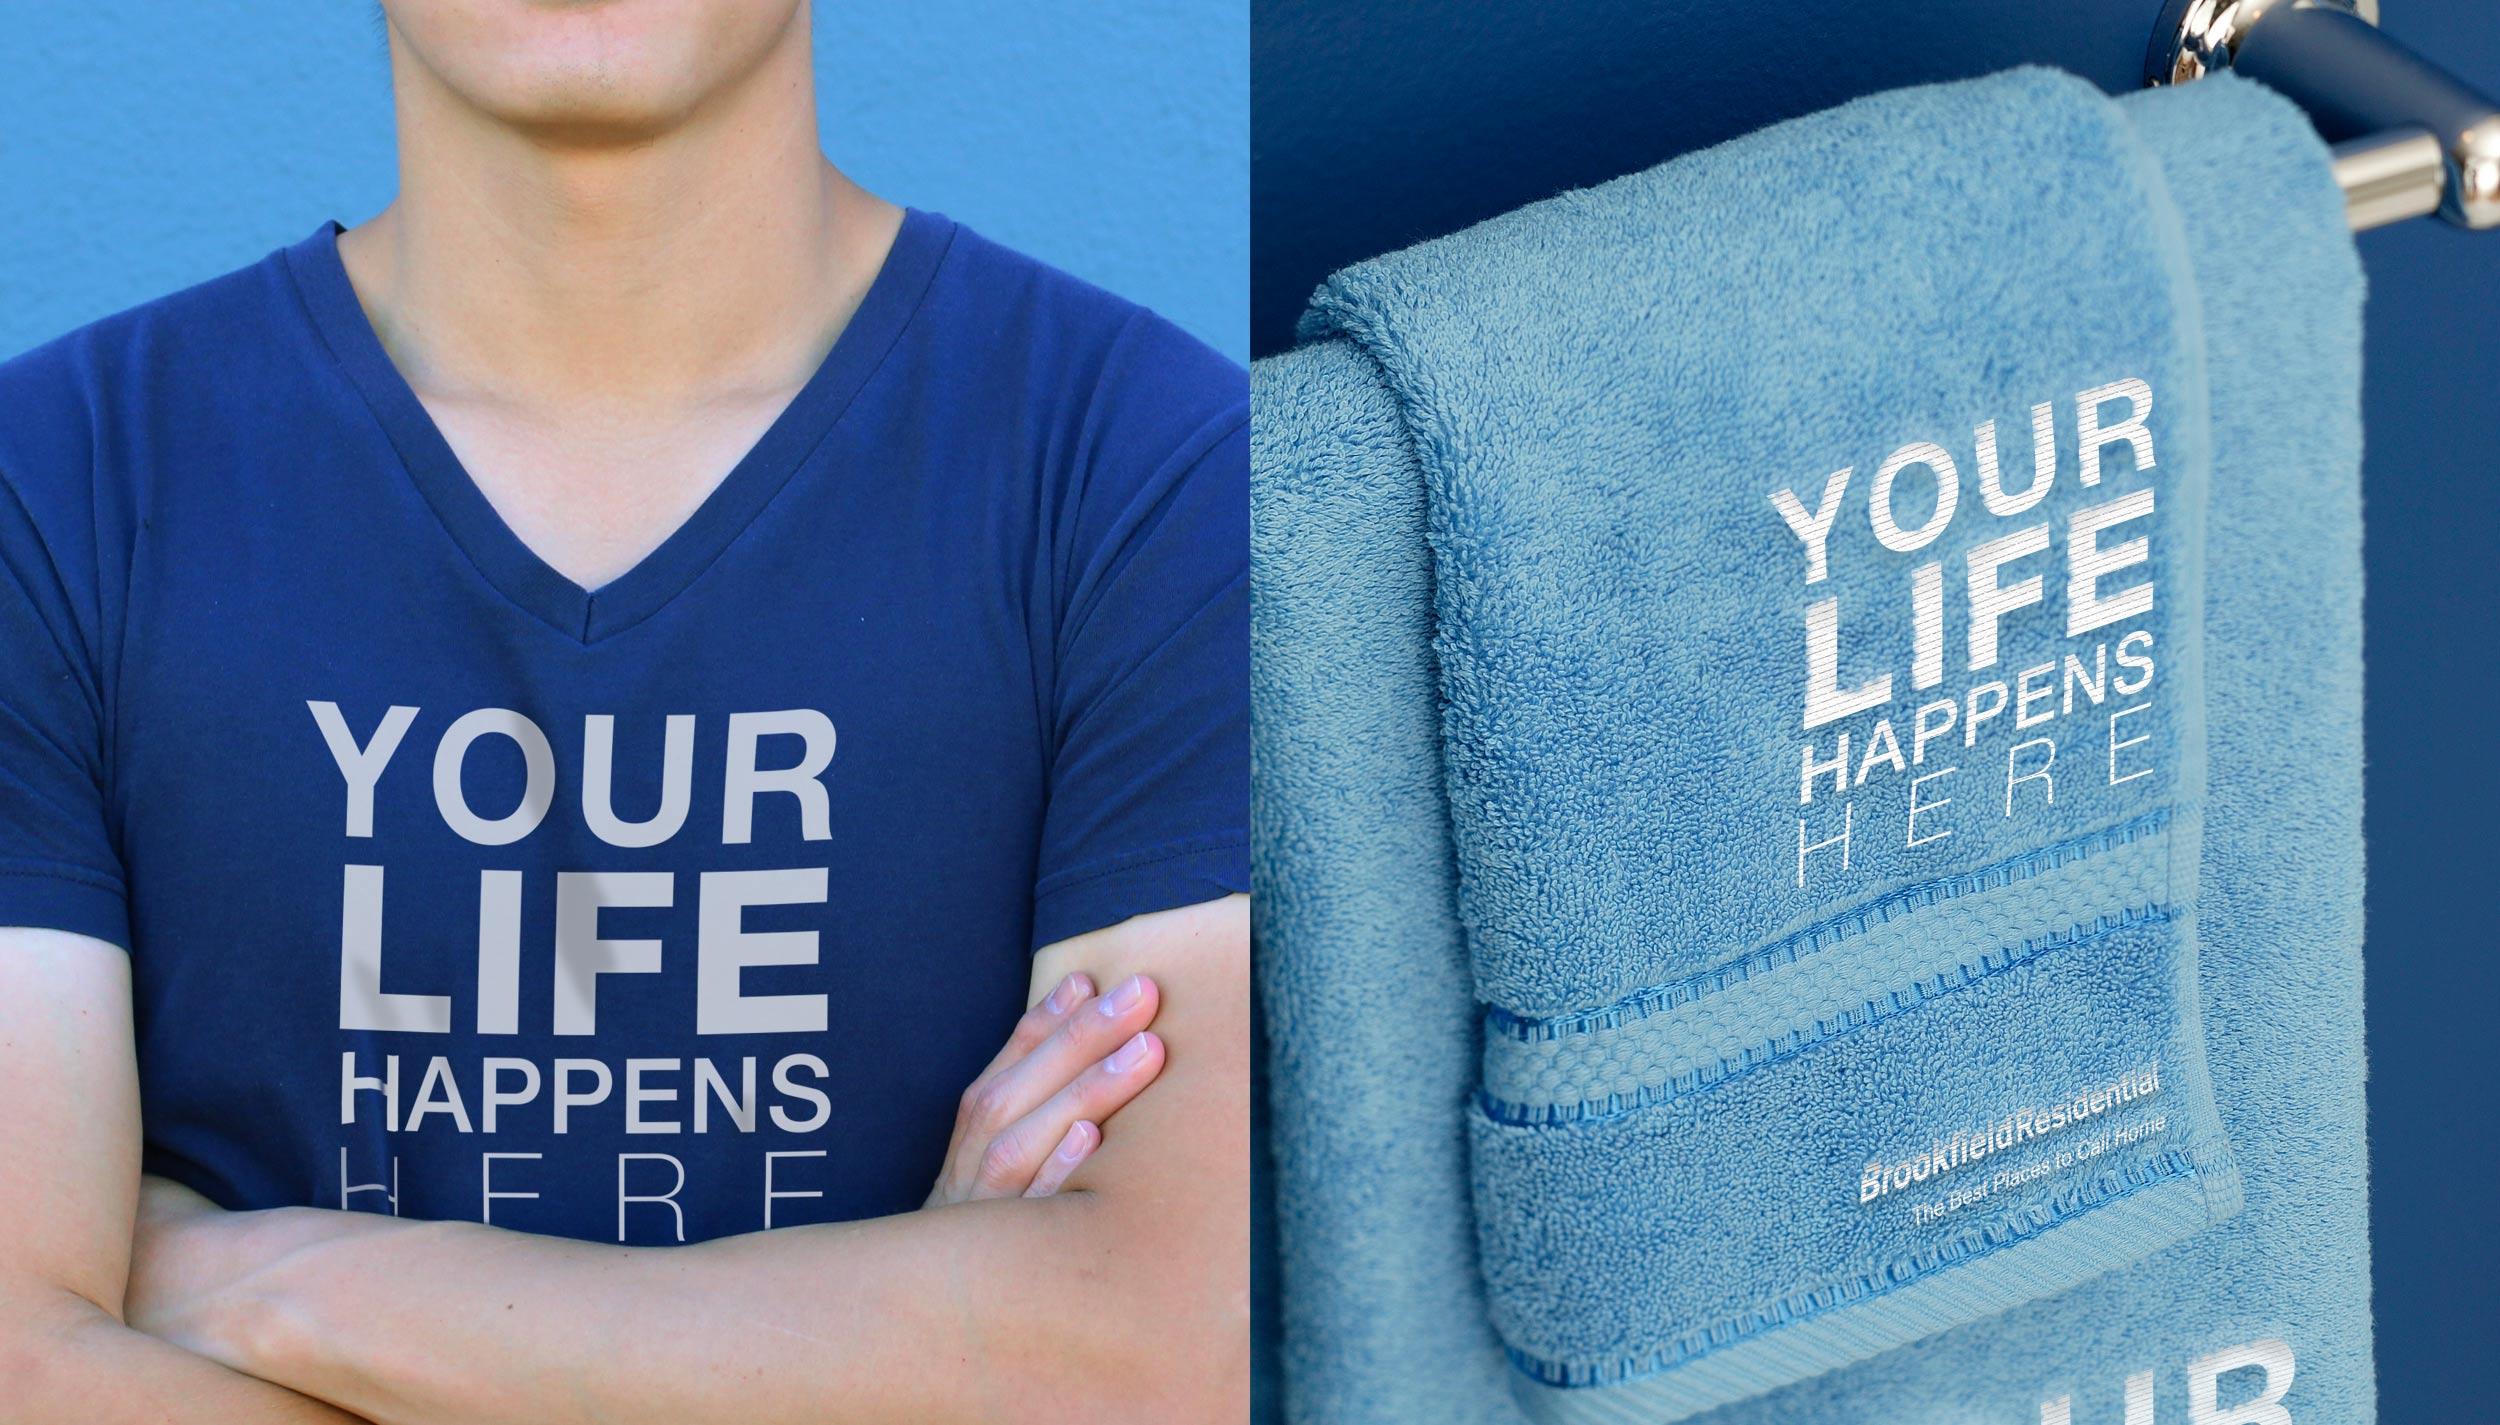 bf_ylhh_shirt_bath_towels_mock.jpg